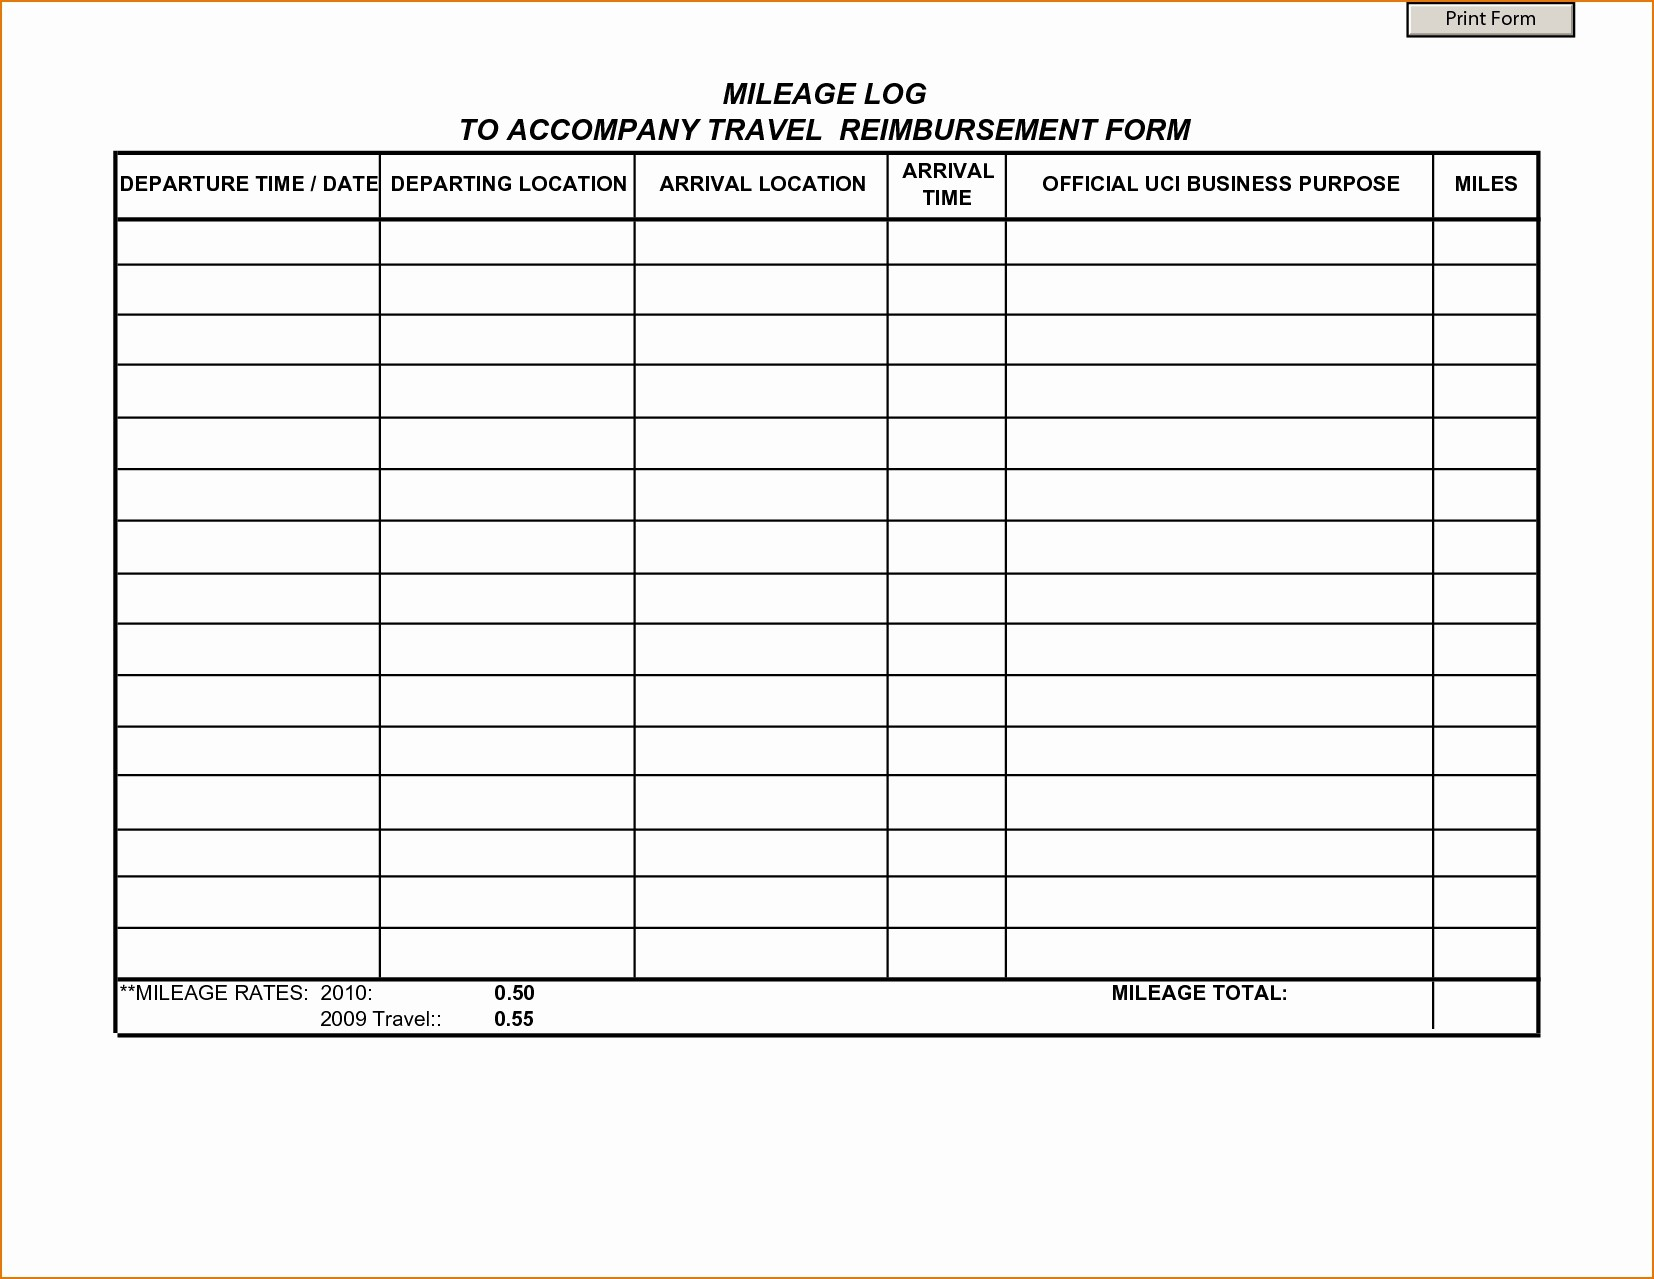 Mileage Expense form Template Free New Mileage Reimbursement form Template